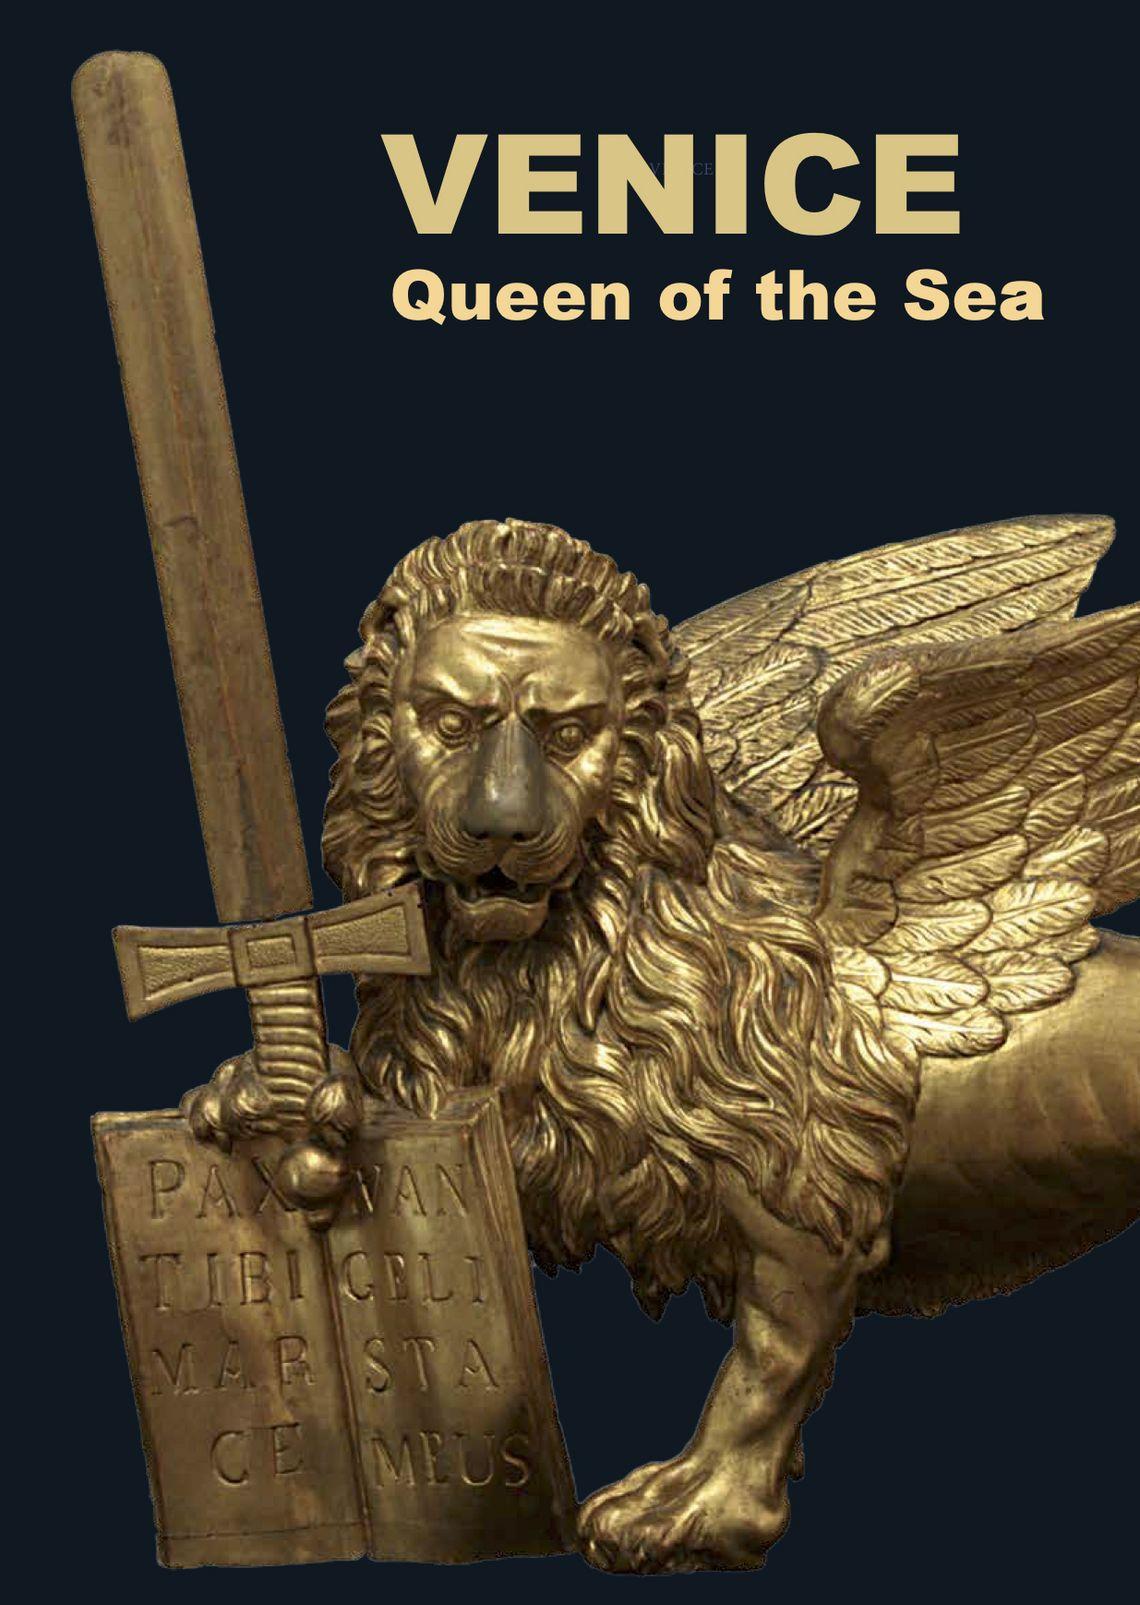 Venice-Queen of the sea